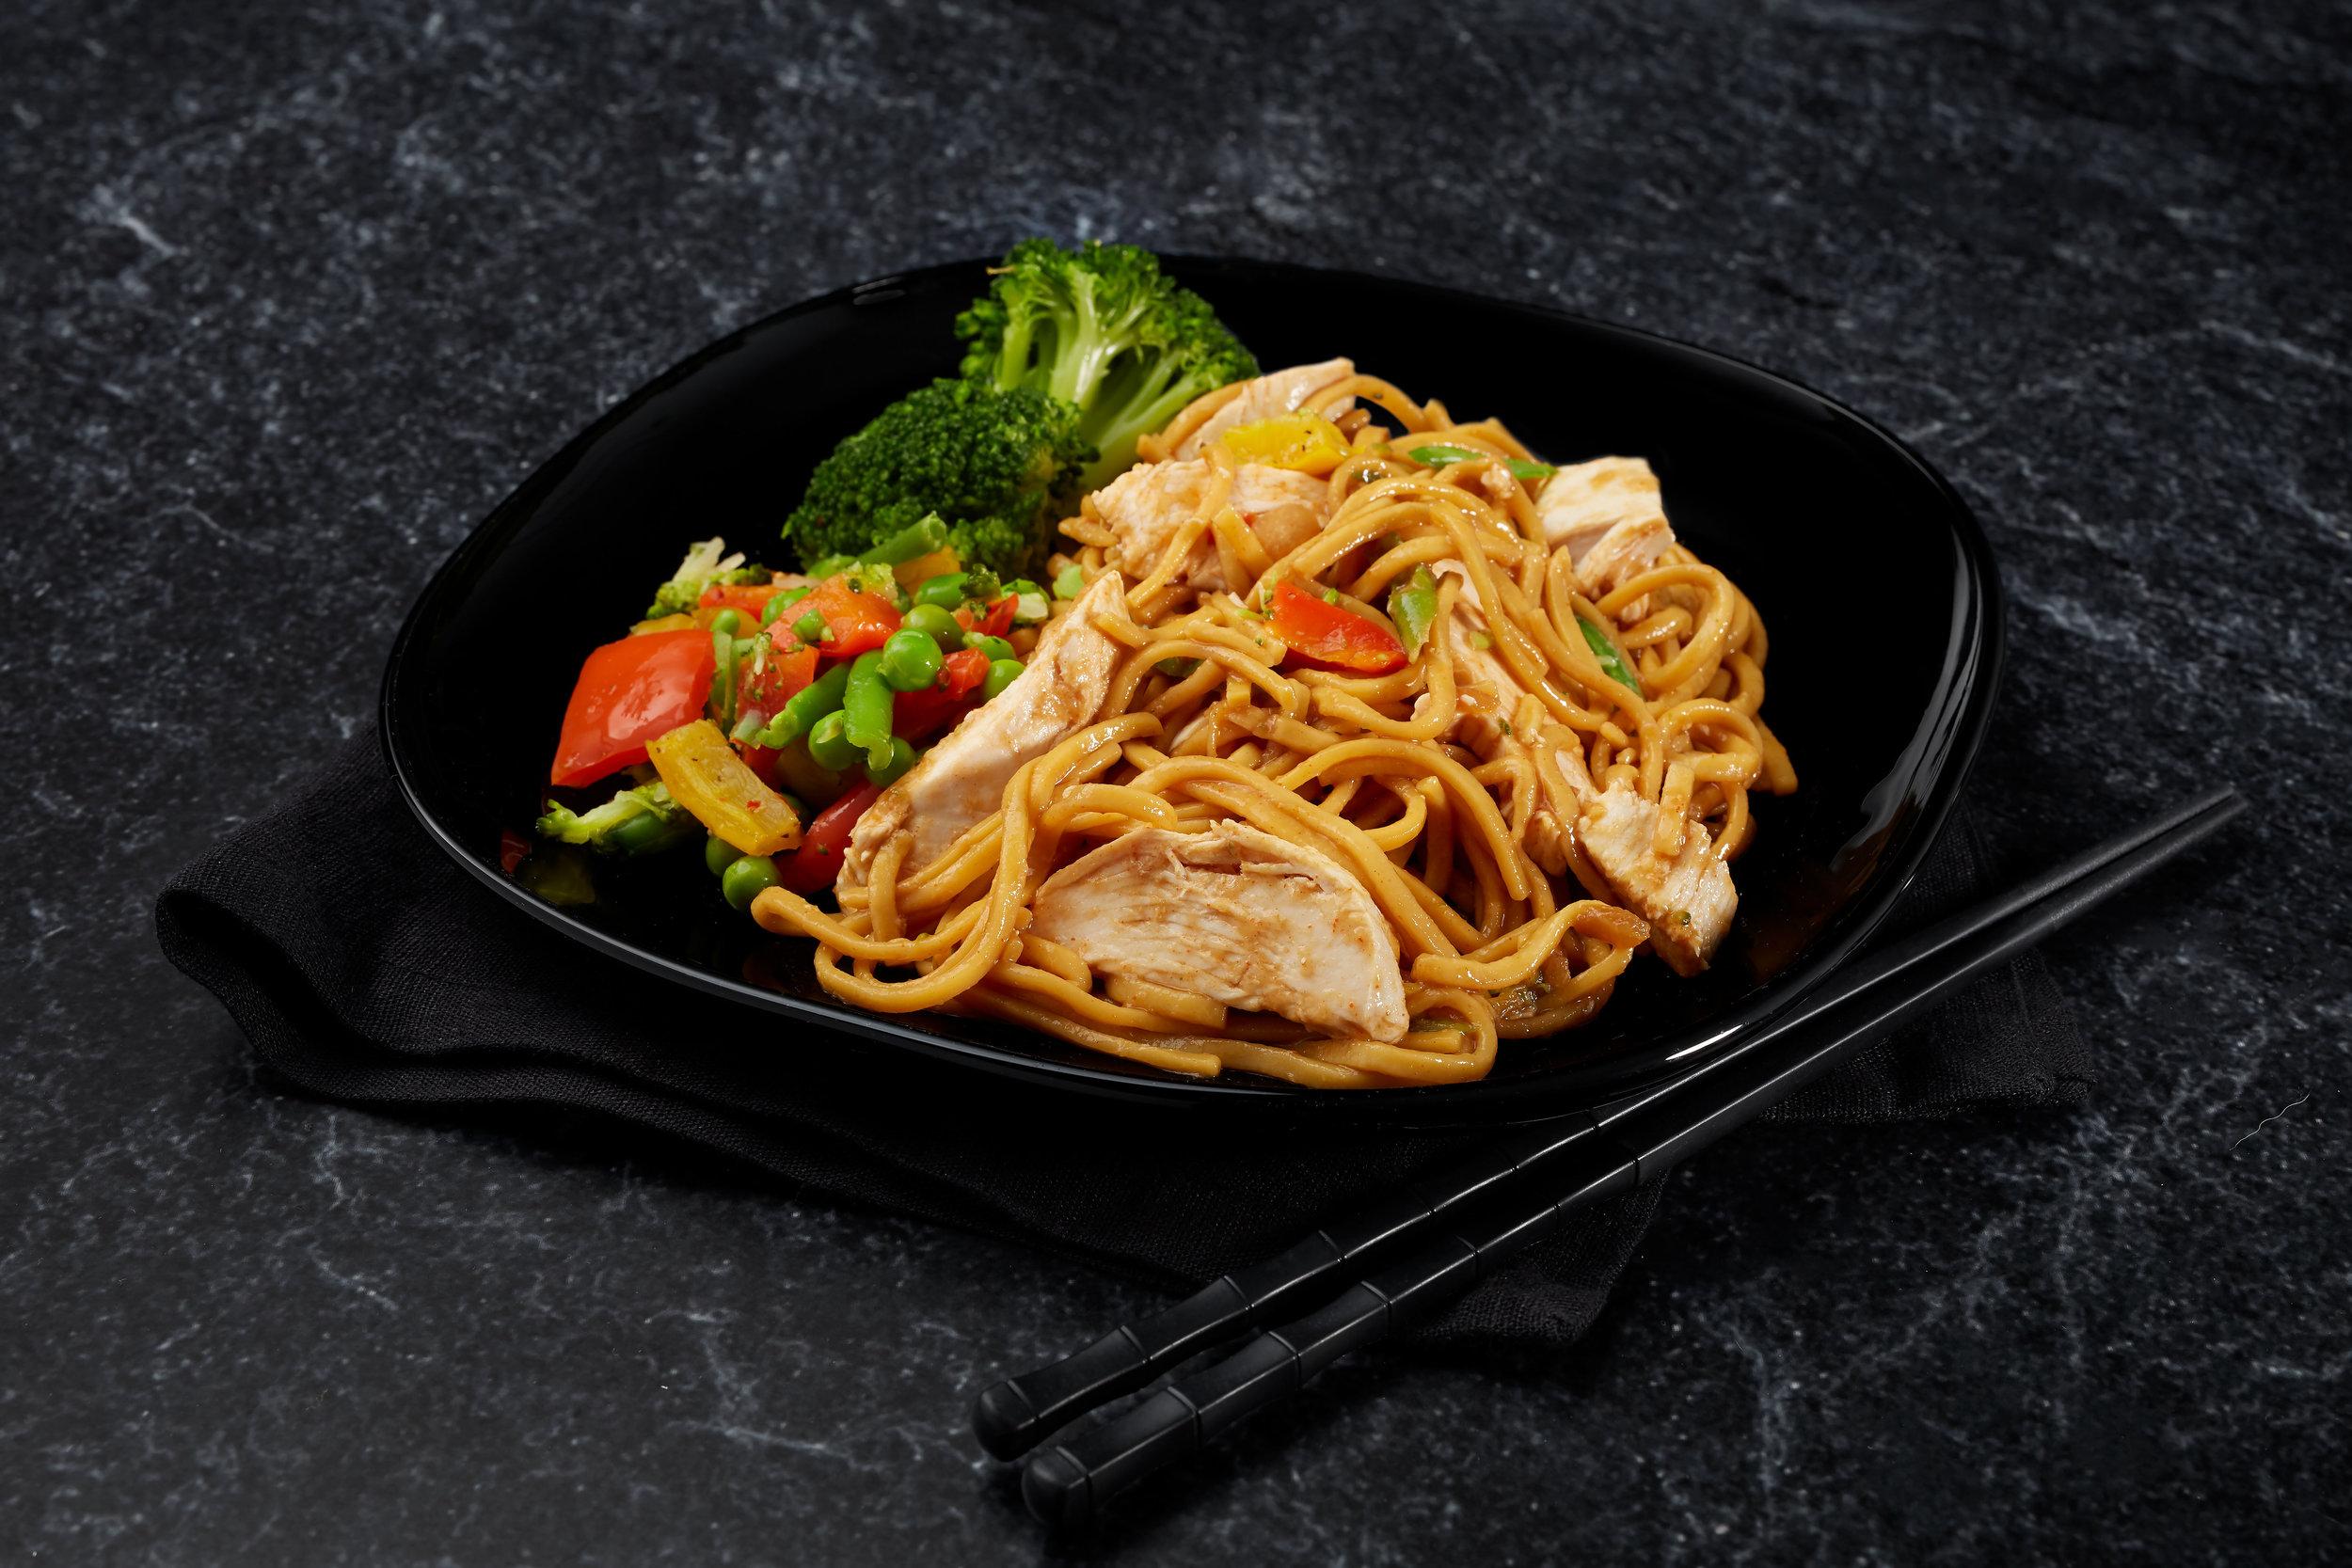 Spicy-noodle.jpg